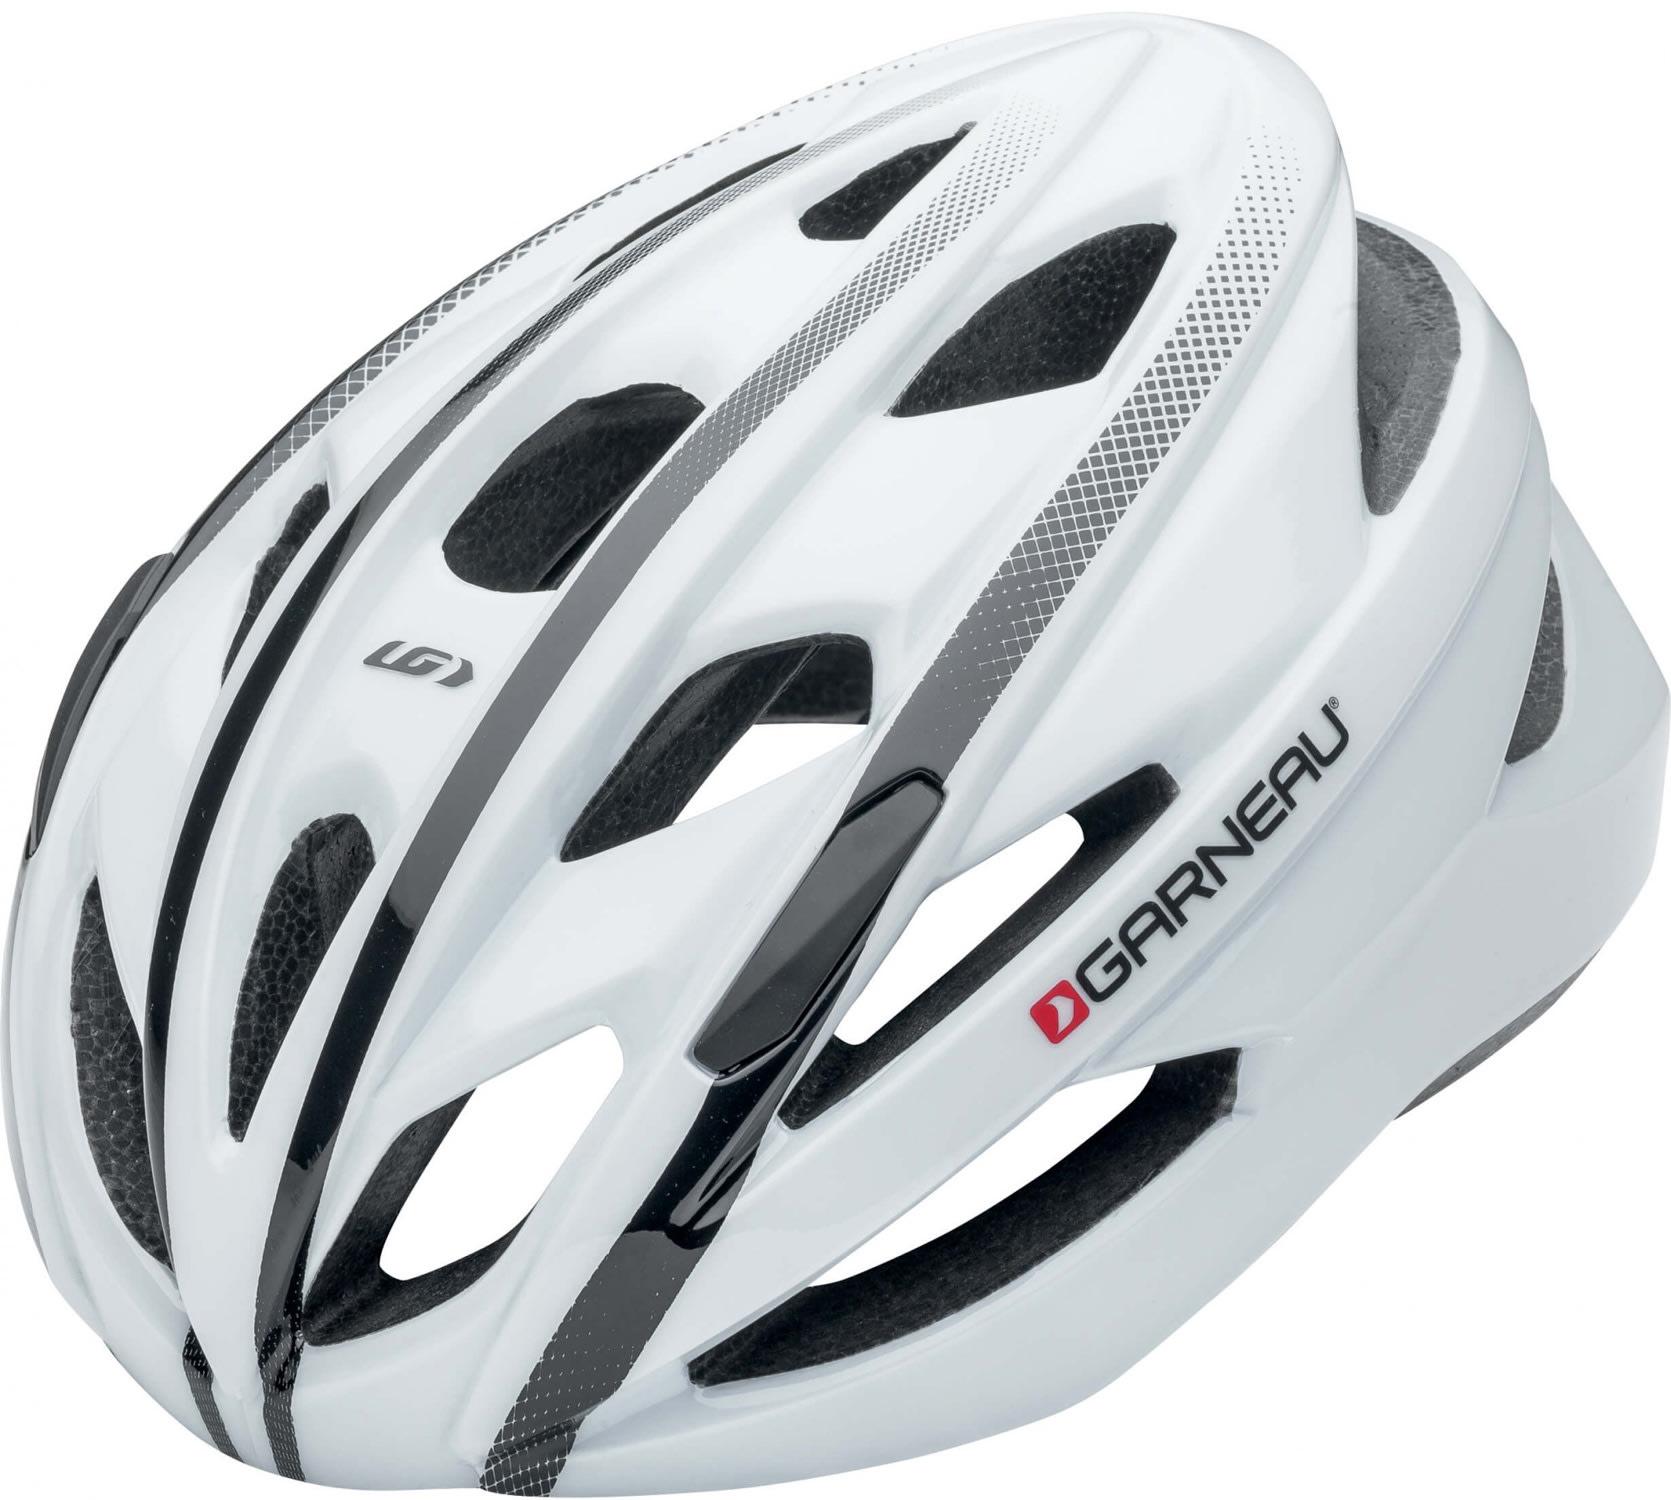 Louis Garneau Astral Bike Helmet Womens